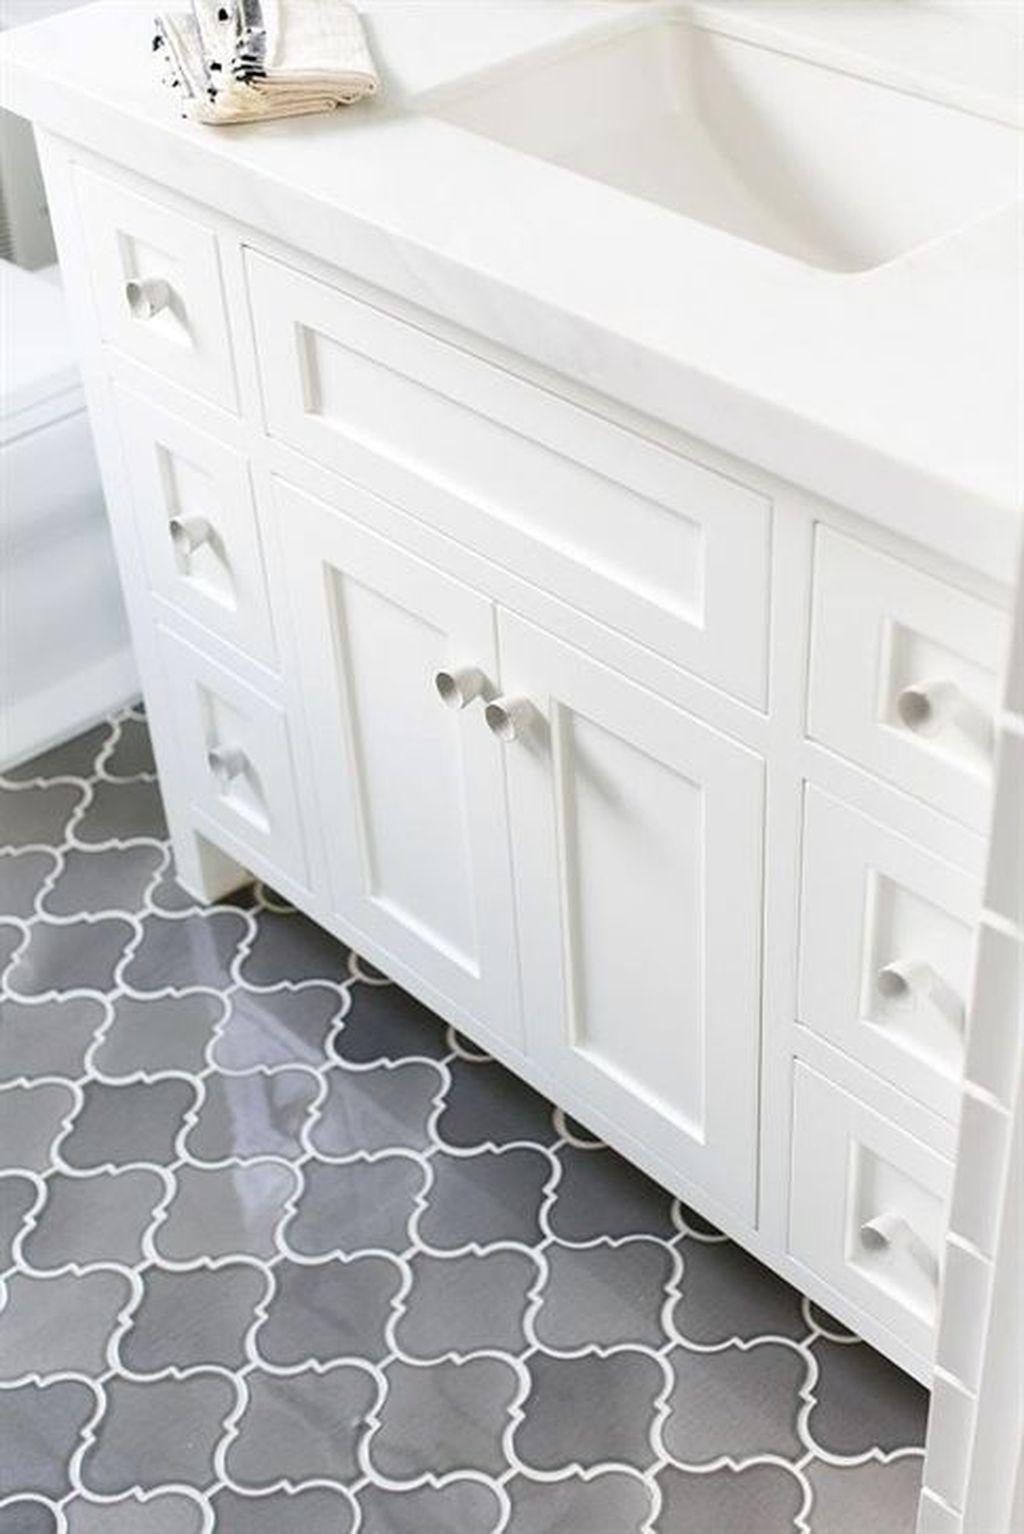 Inspiring Bathroom Tile Ideas 17